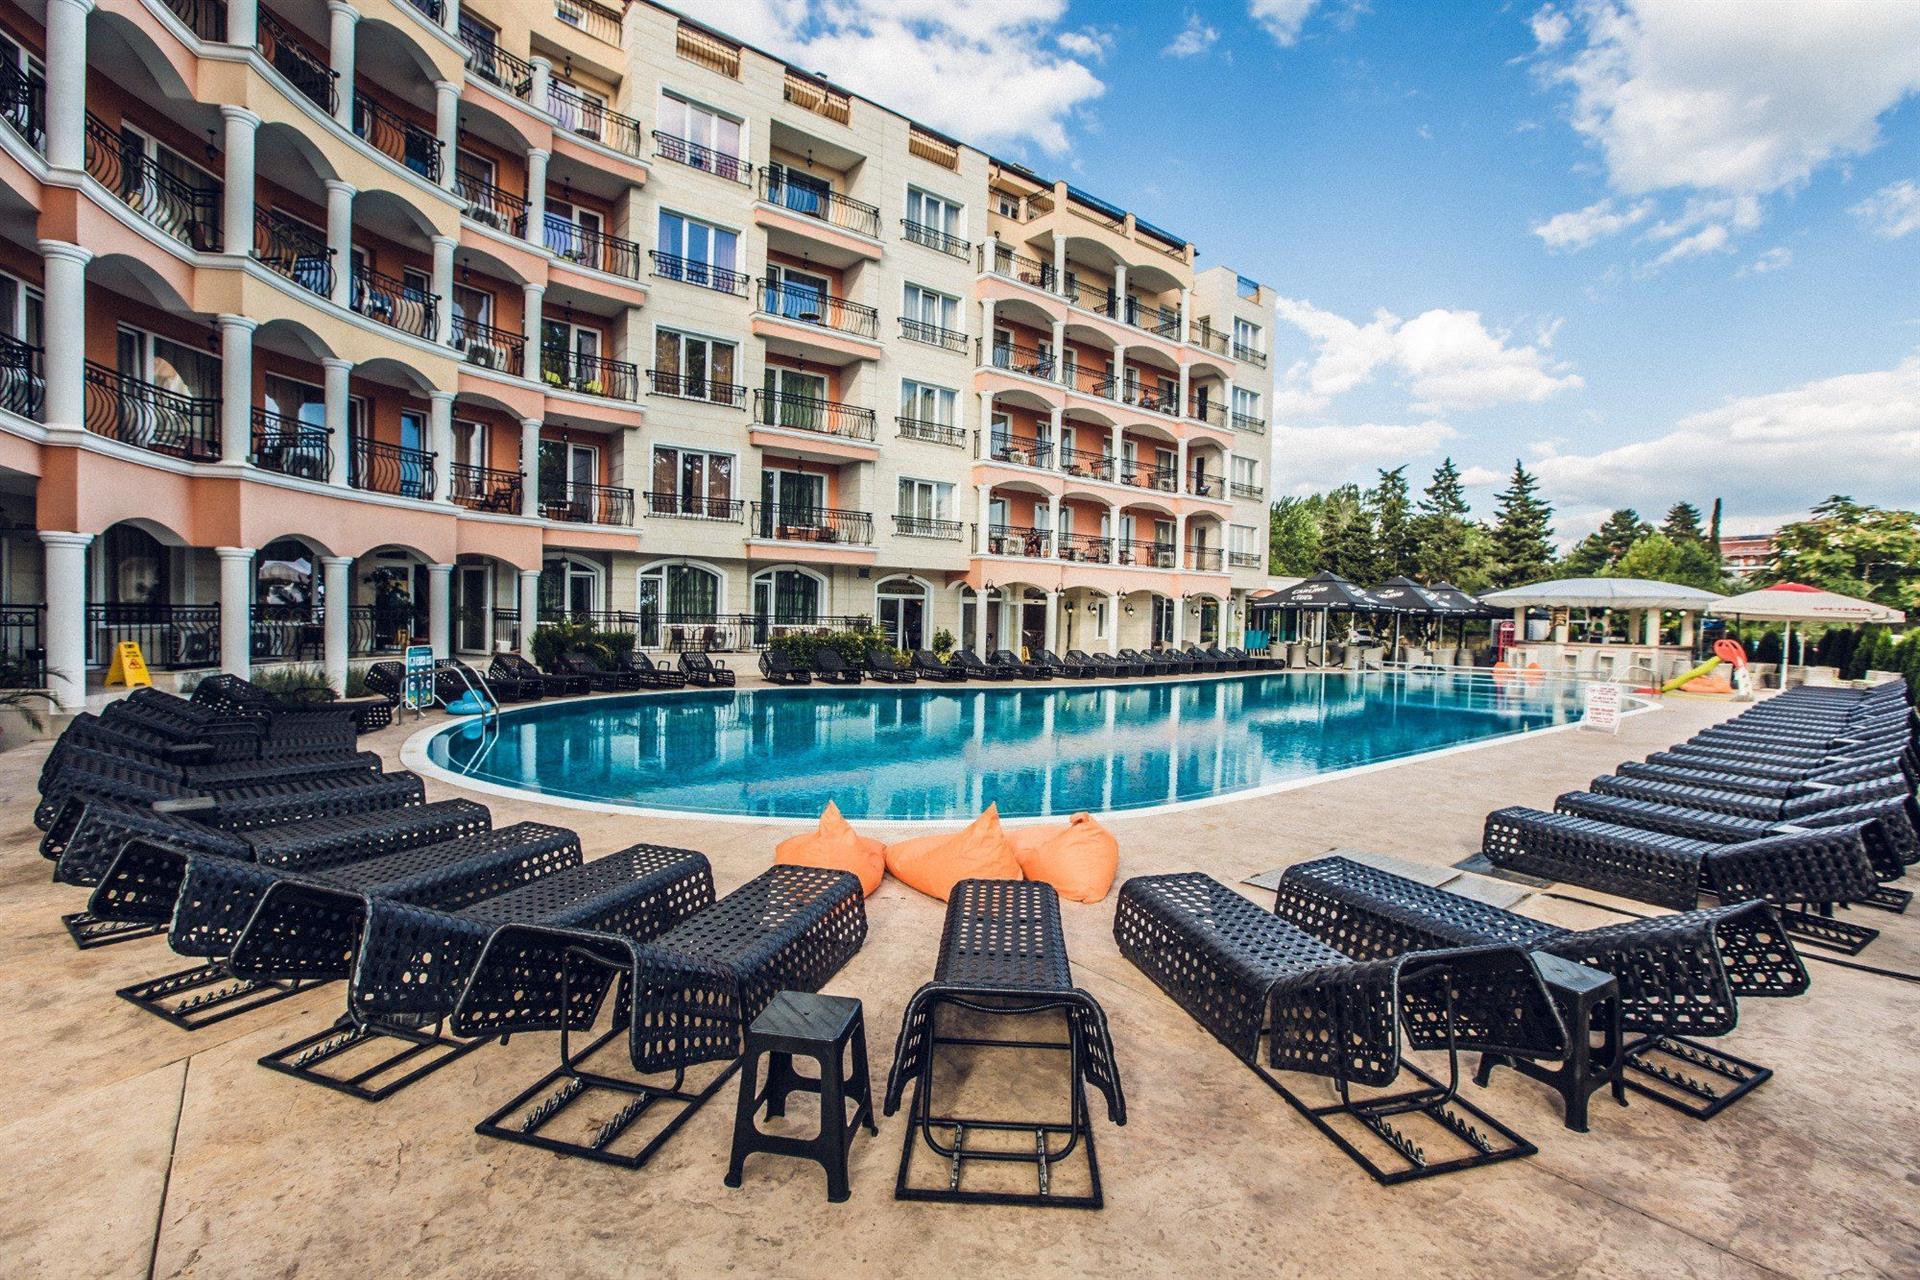 APART HOTEL AVENUE DELUXE 3